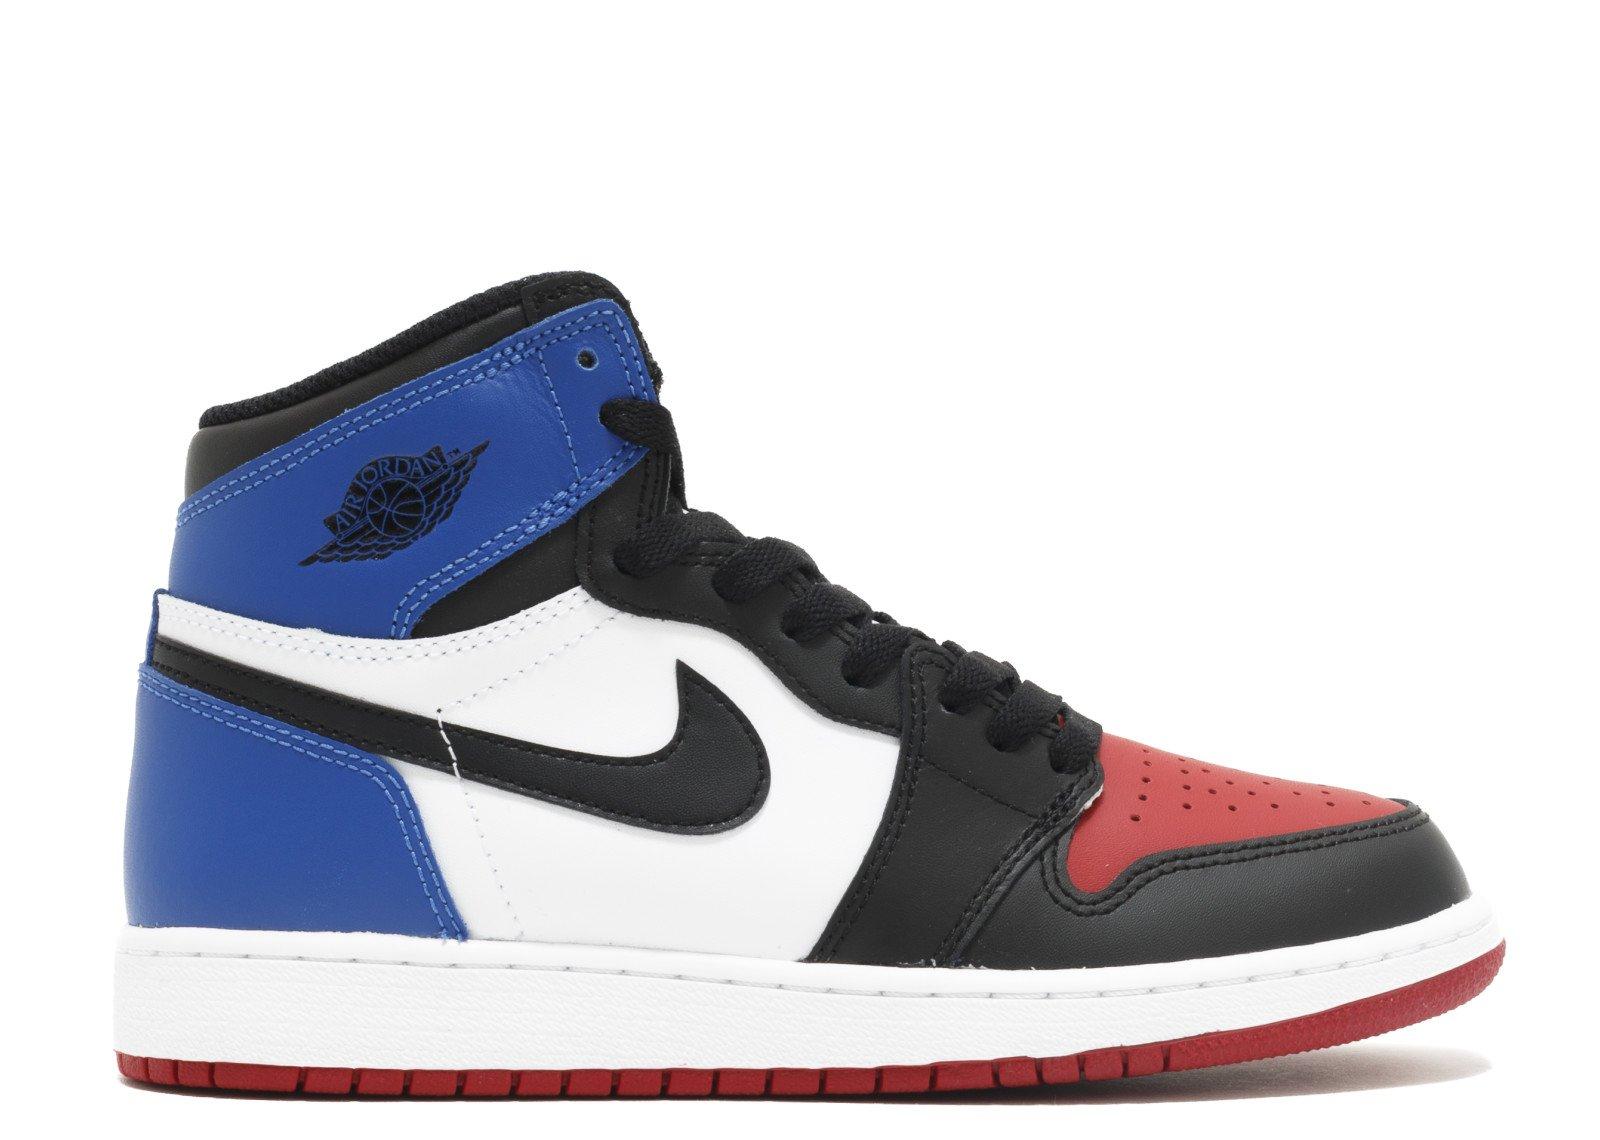 Nike Air Jordan 1 Retro High Top 3 Pick OG BG LTD Sneaker Current Collection black / white / blue / red, EU Shoe Size:EUR 36.5, Color:black